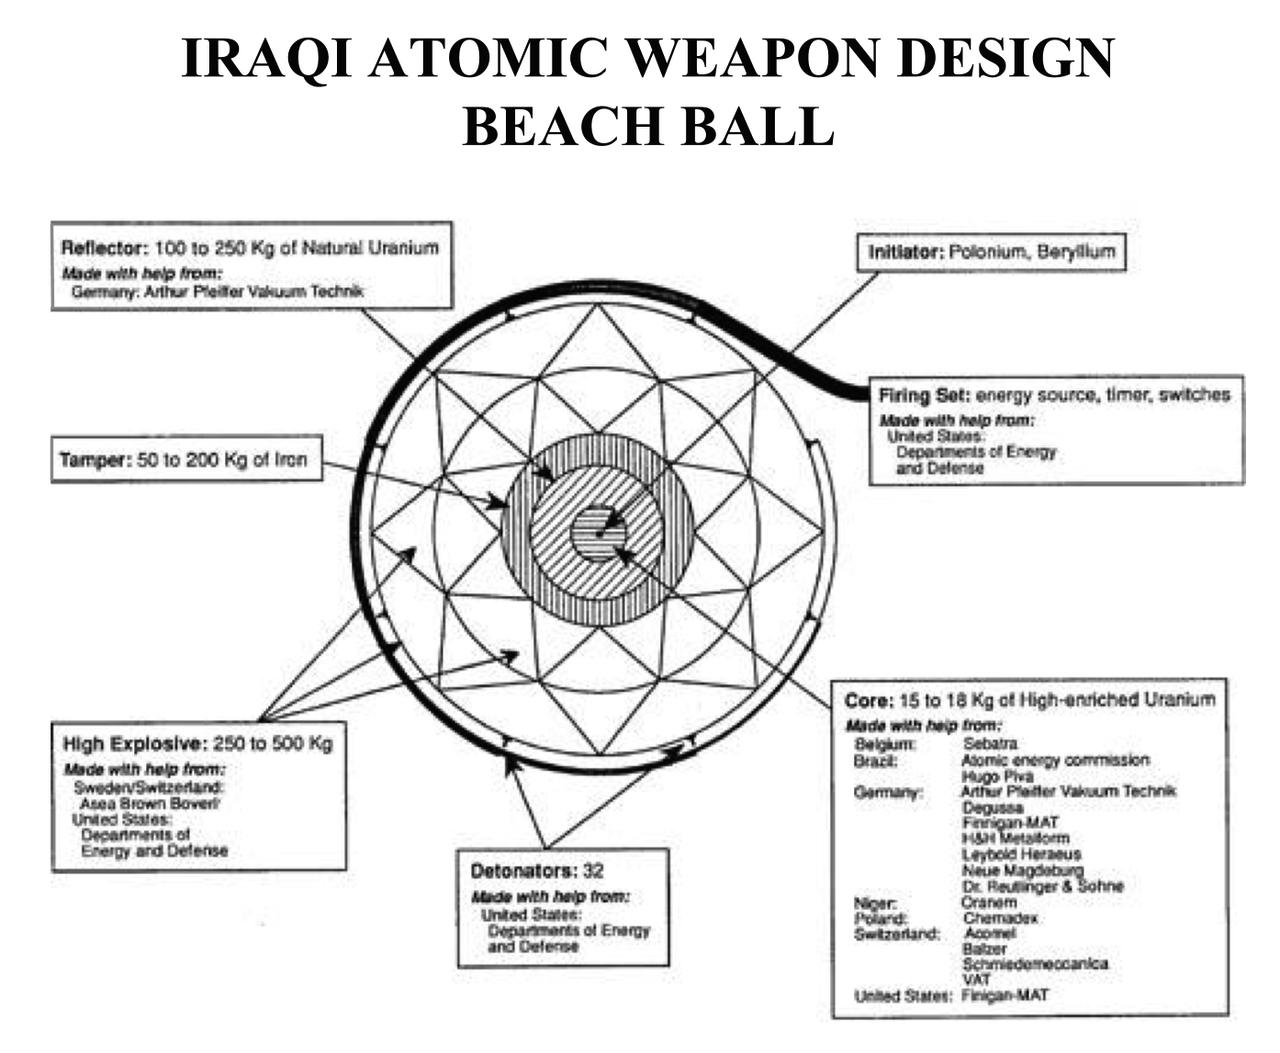 IRAQI ATOMIC WEAPON DESIGN BEACH BALL